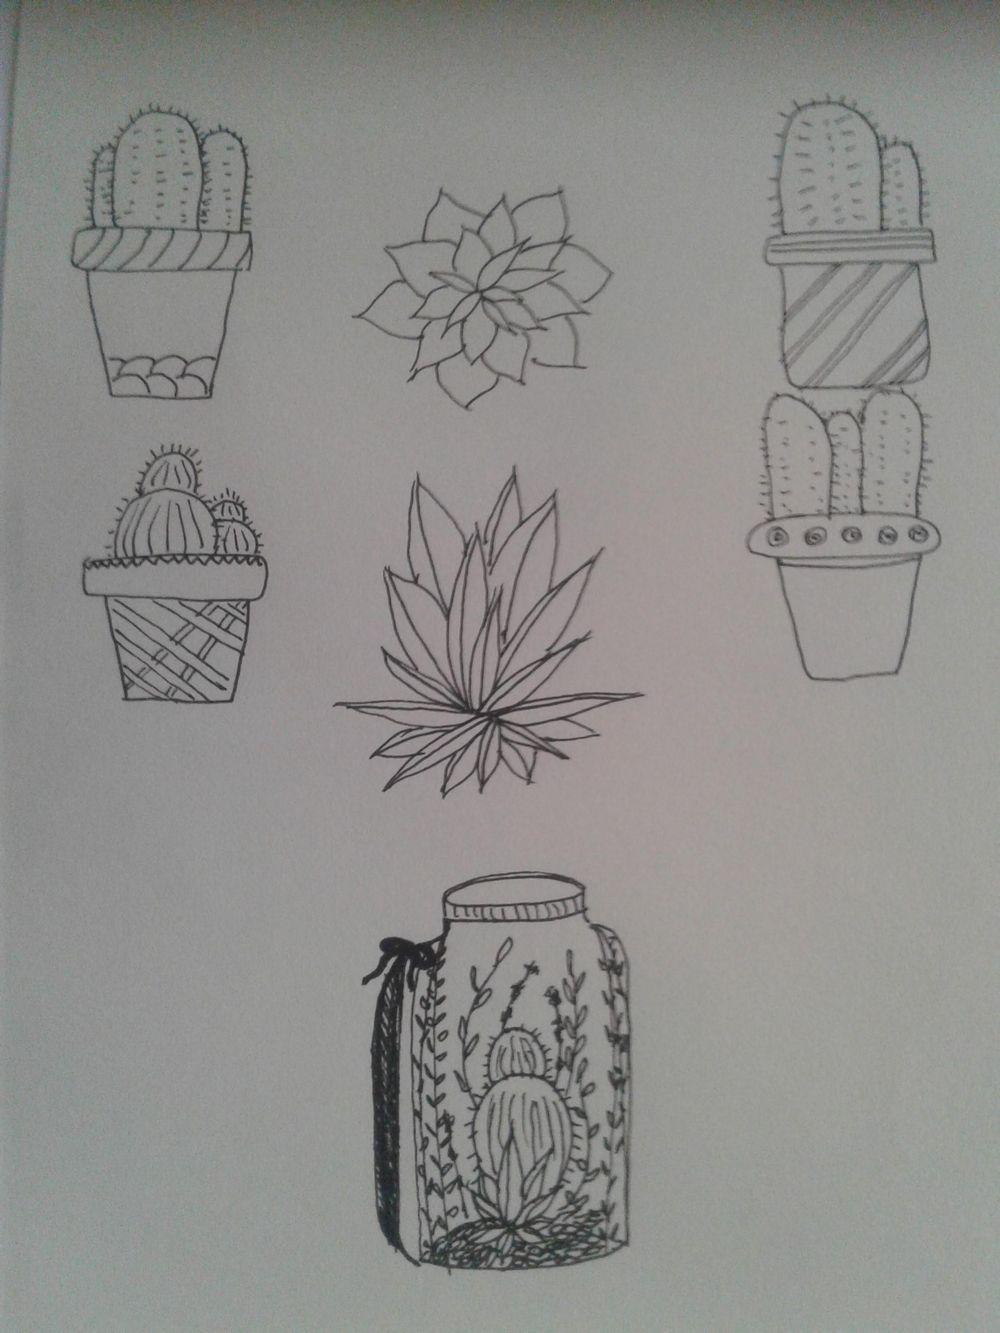 Floral Doodles - image 3 - student project